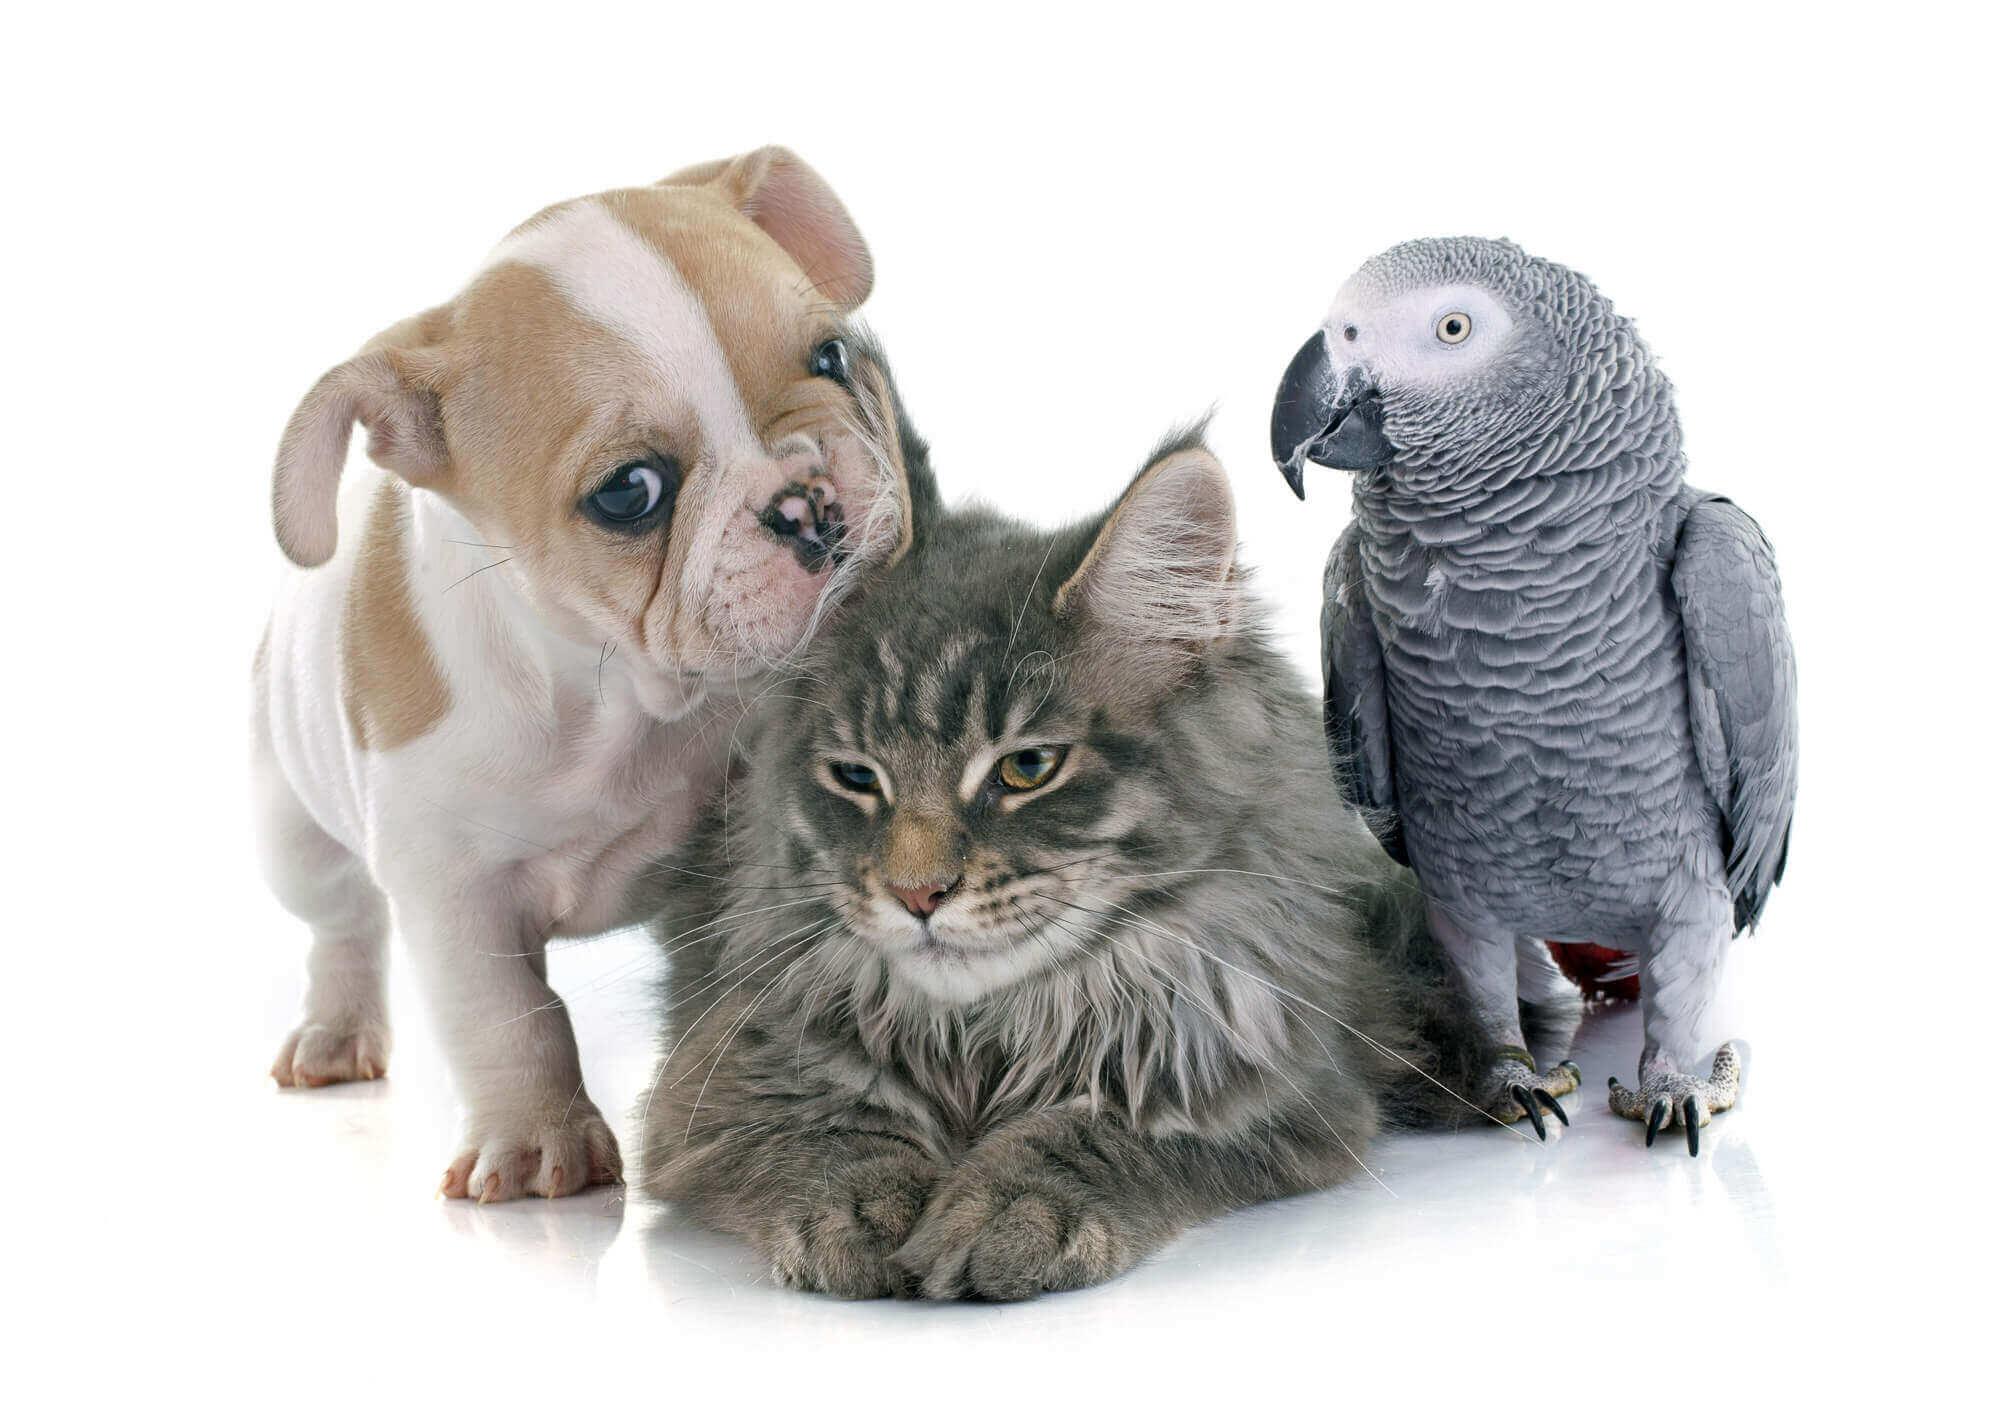 Wallpaper Perritos 3d Veterinarian Salem Veterinary Services Salem Ma All